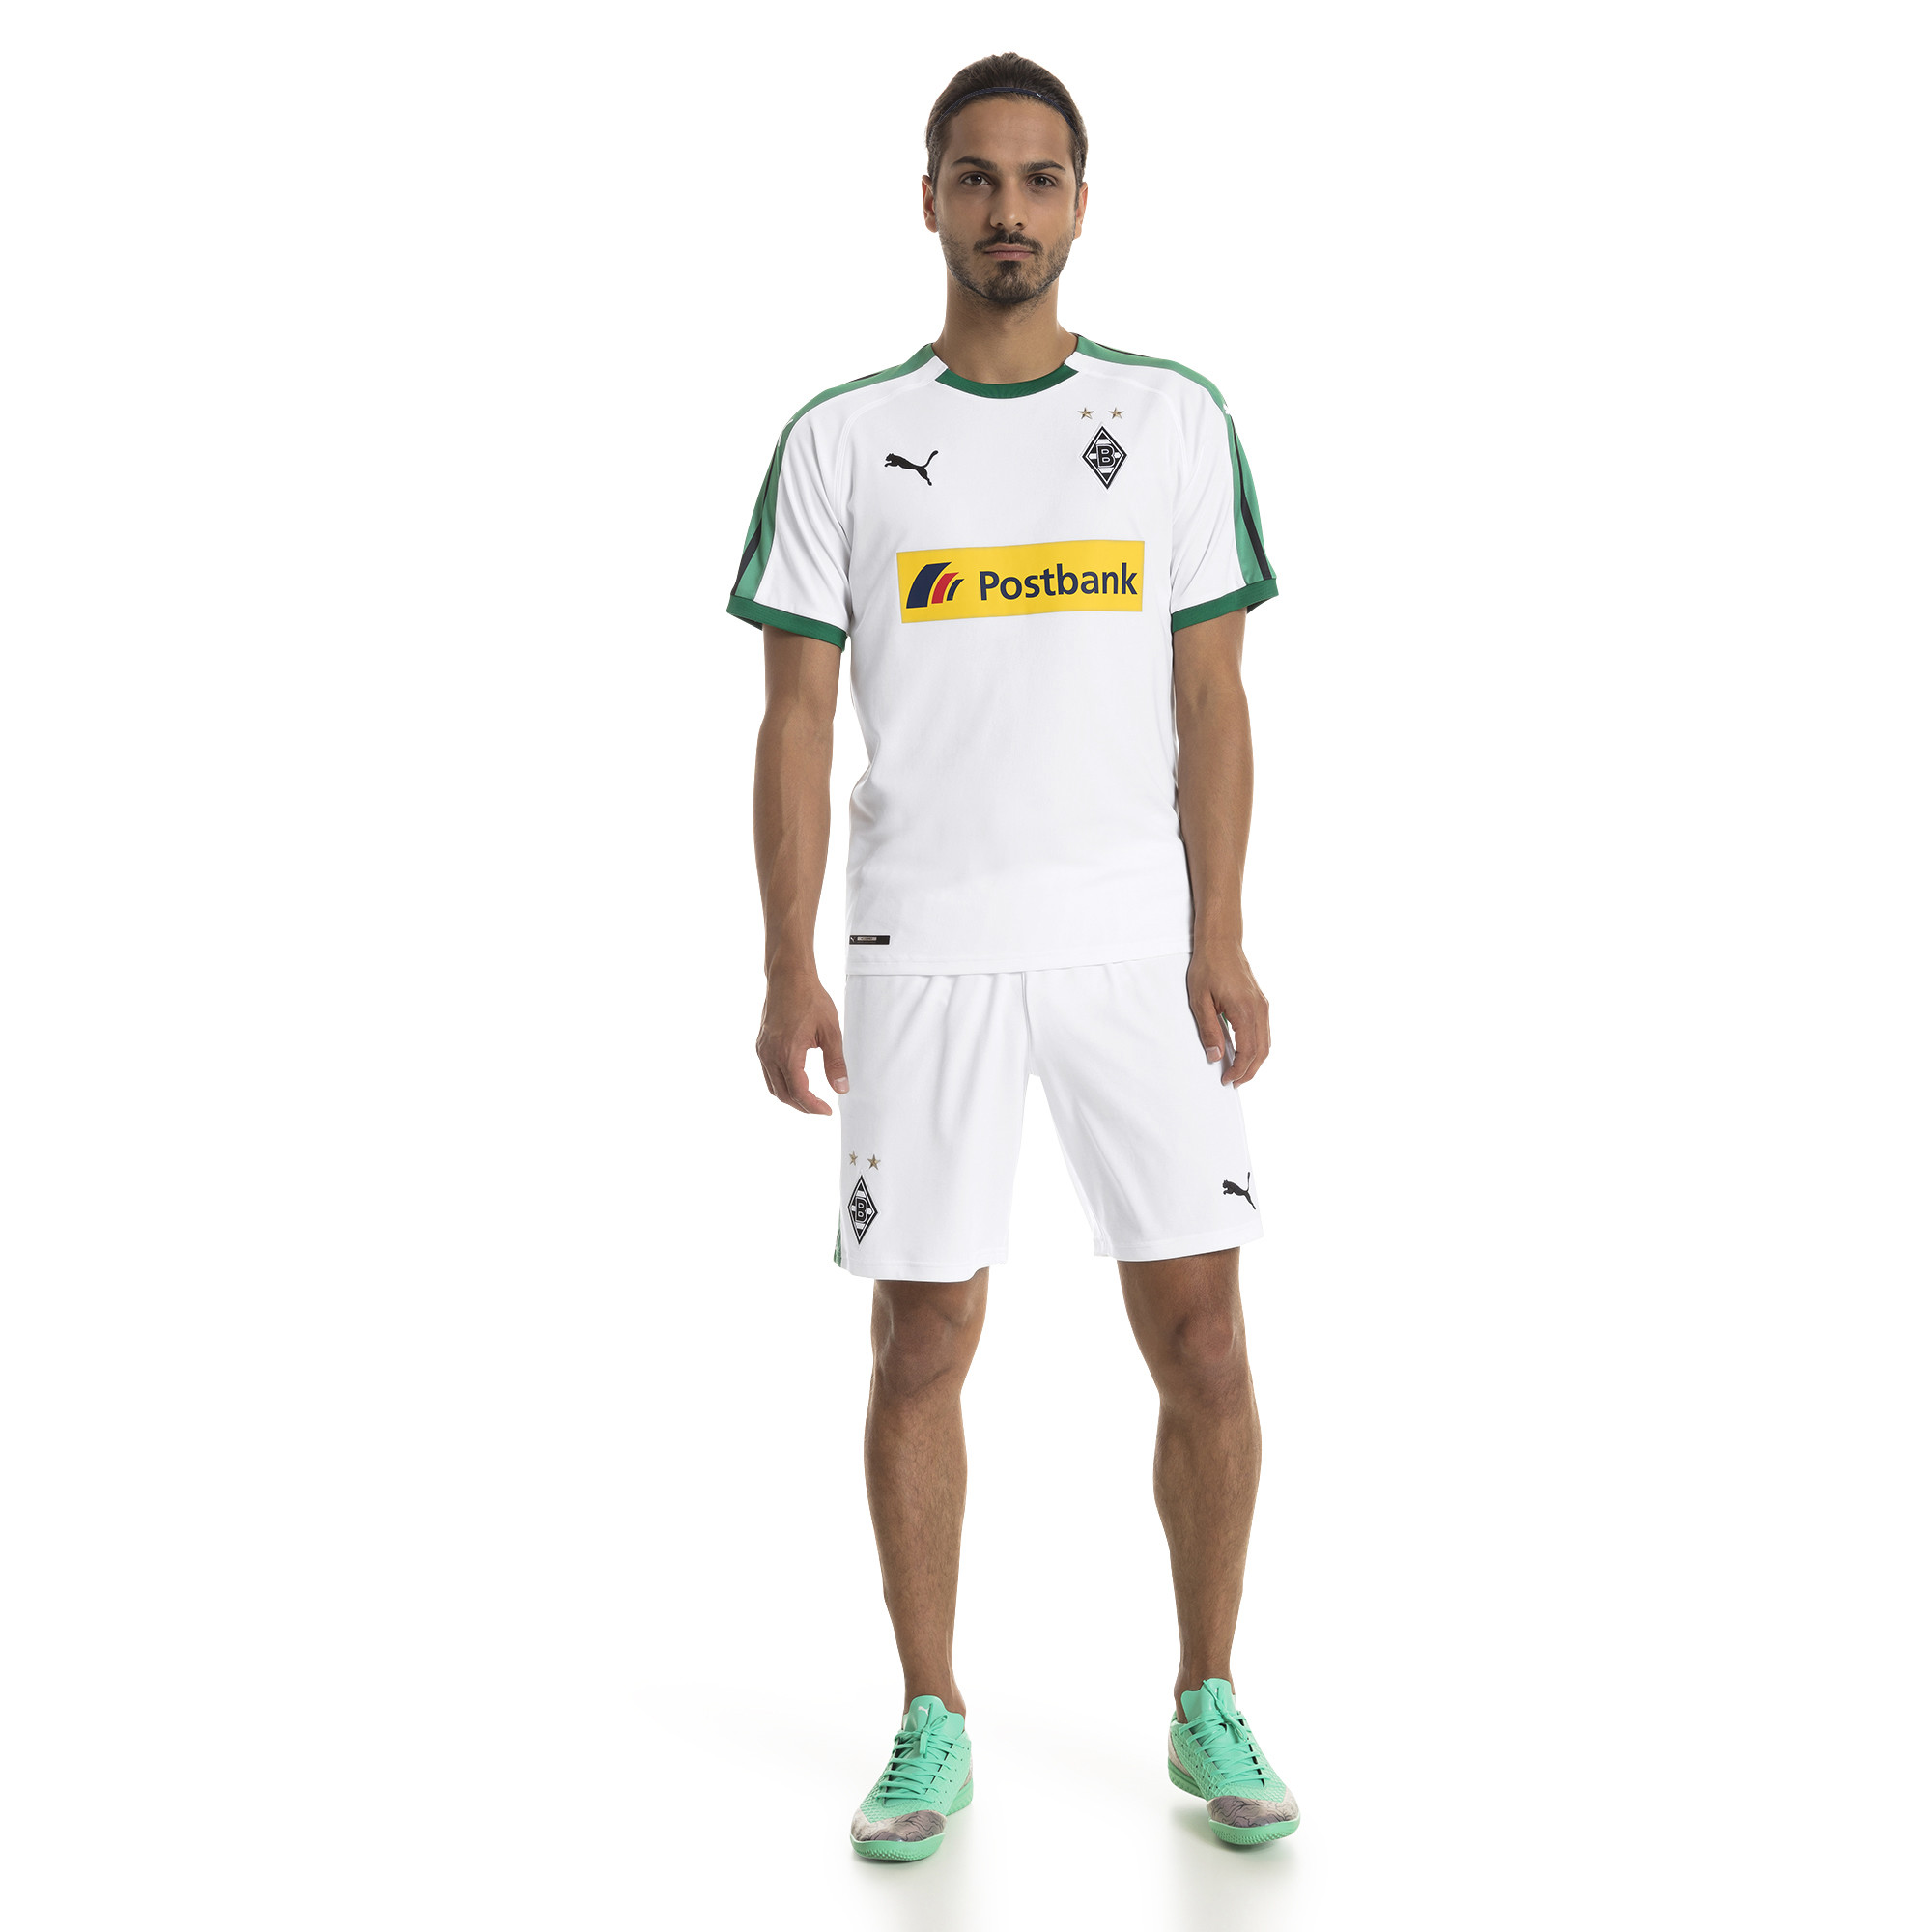 Indexbild 6 - PUMA Borussia Mönchengladbach Herren Replica Heimtrikot Männer Fußballtrikot Neu